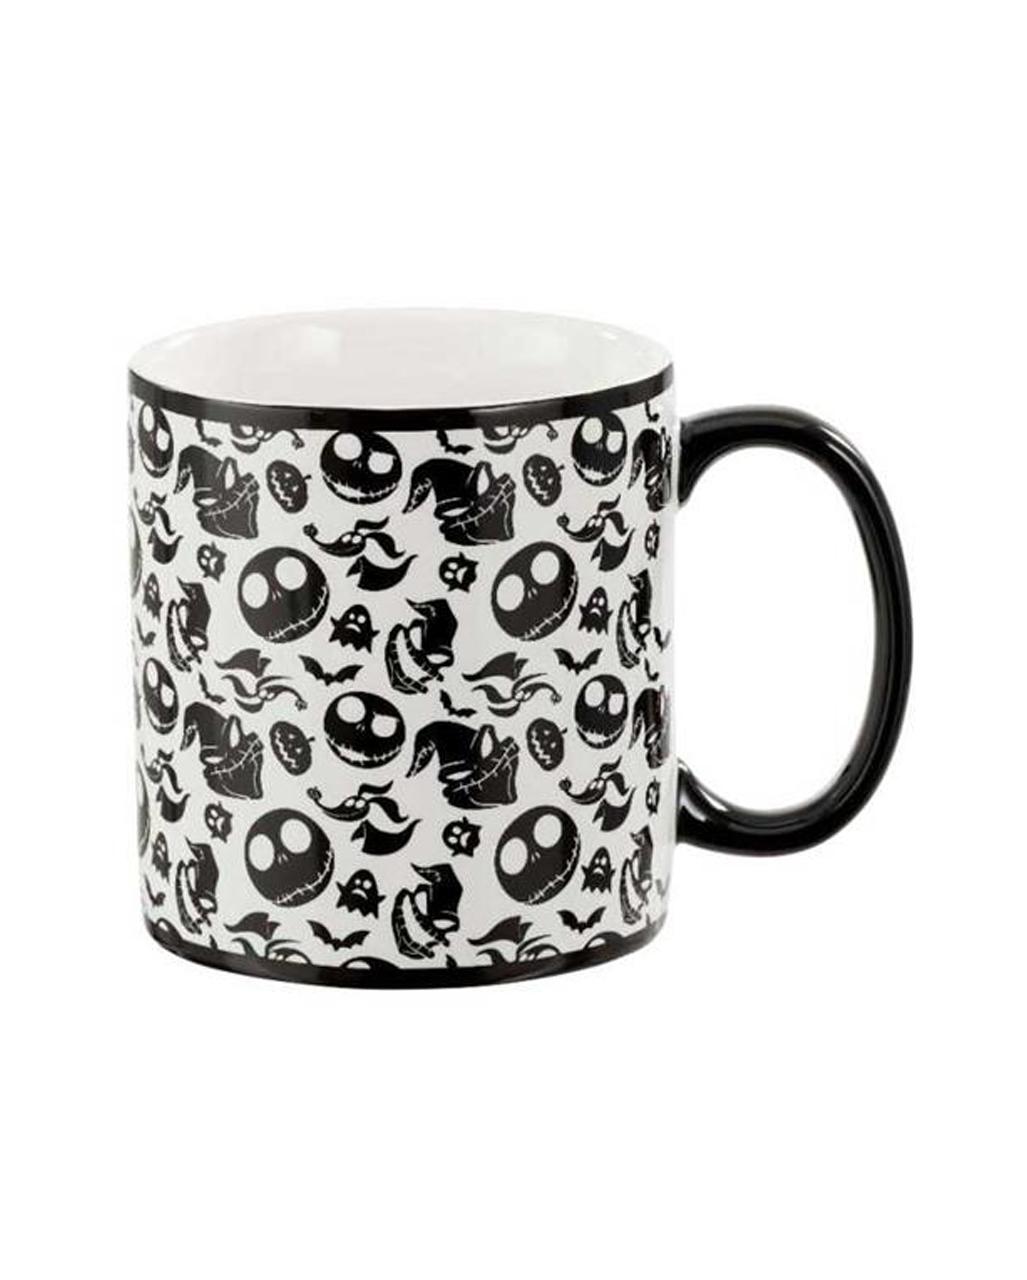 Nightmare Before Christmas Coffee Mug.The Nightmare Before Christmas Xl Cup